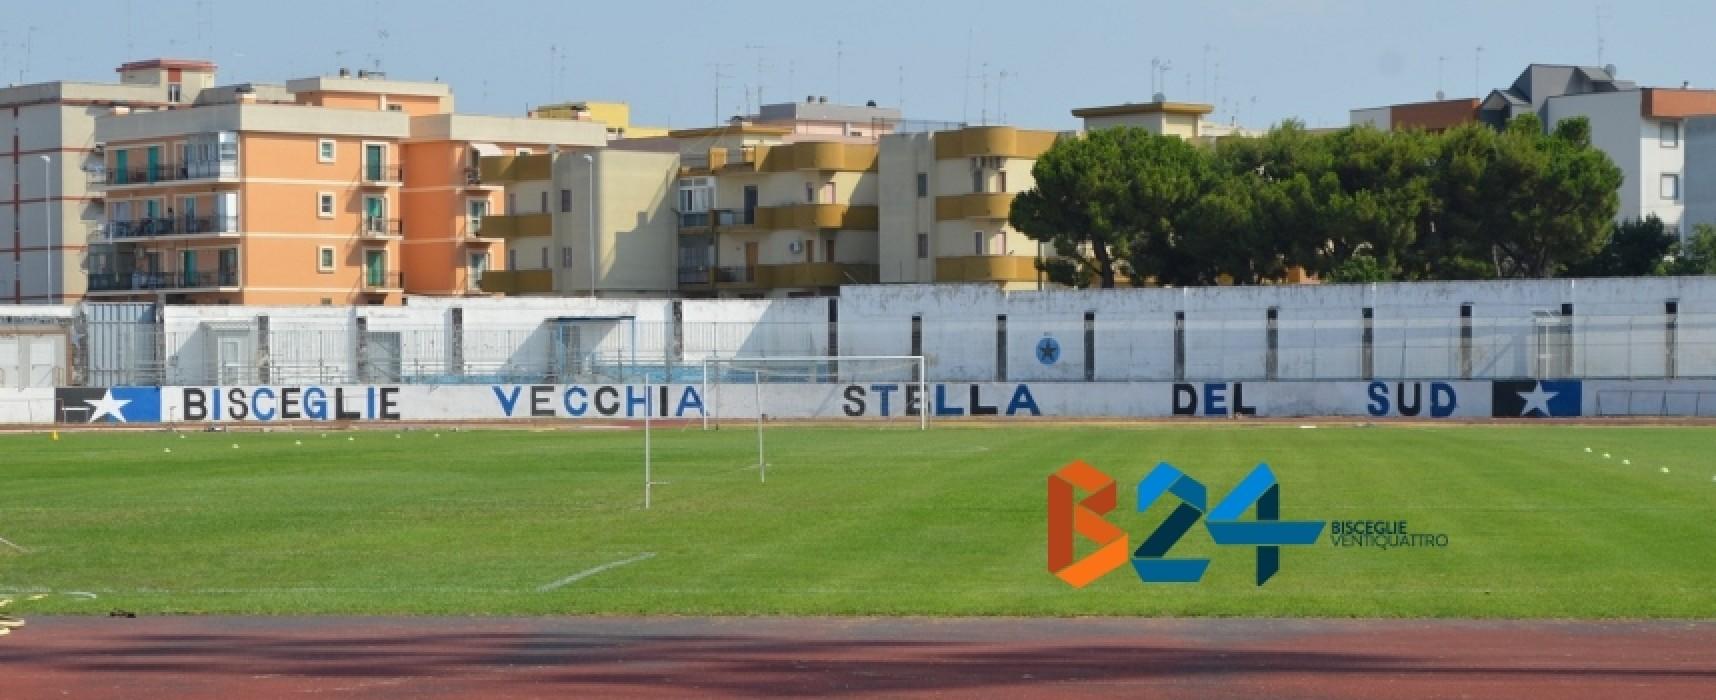 Calcio: Bisceglie-Vibonese si giocherà a porte aperte